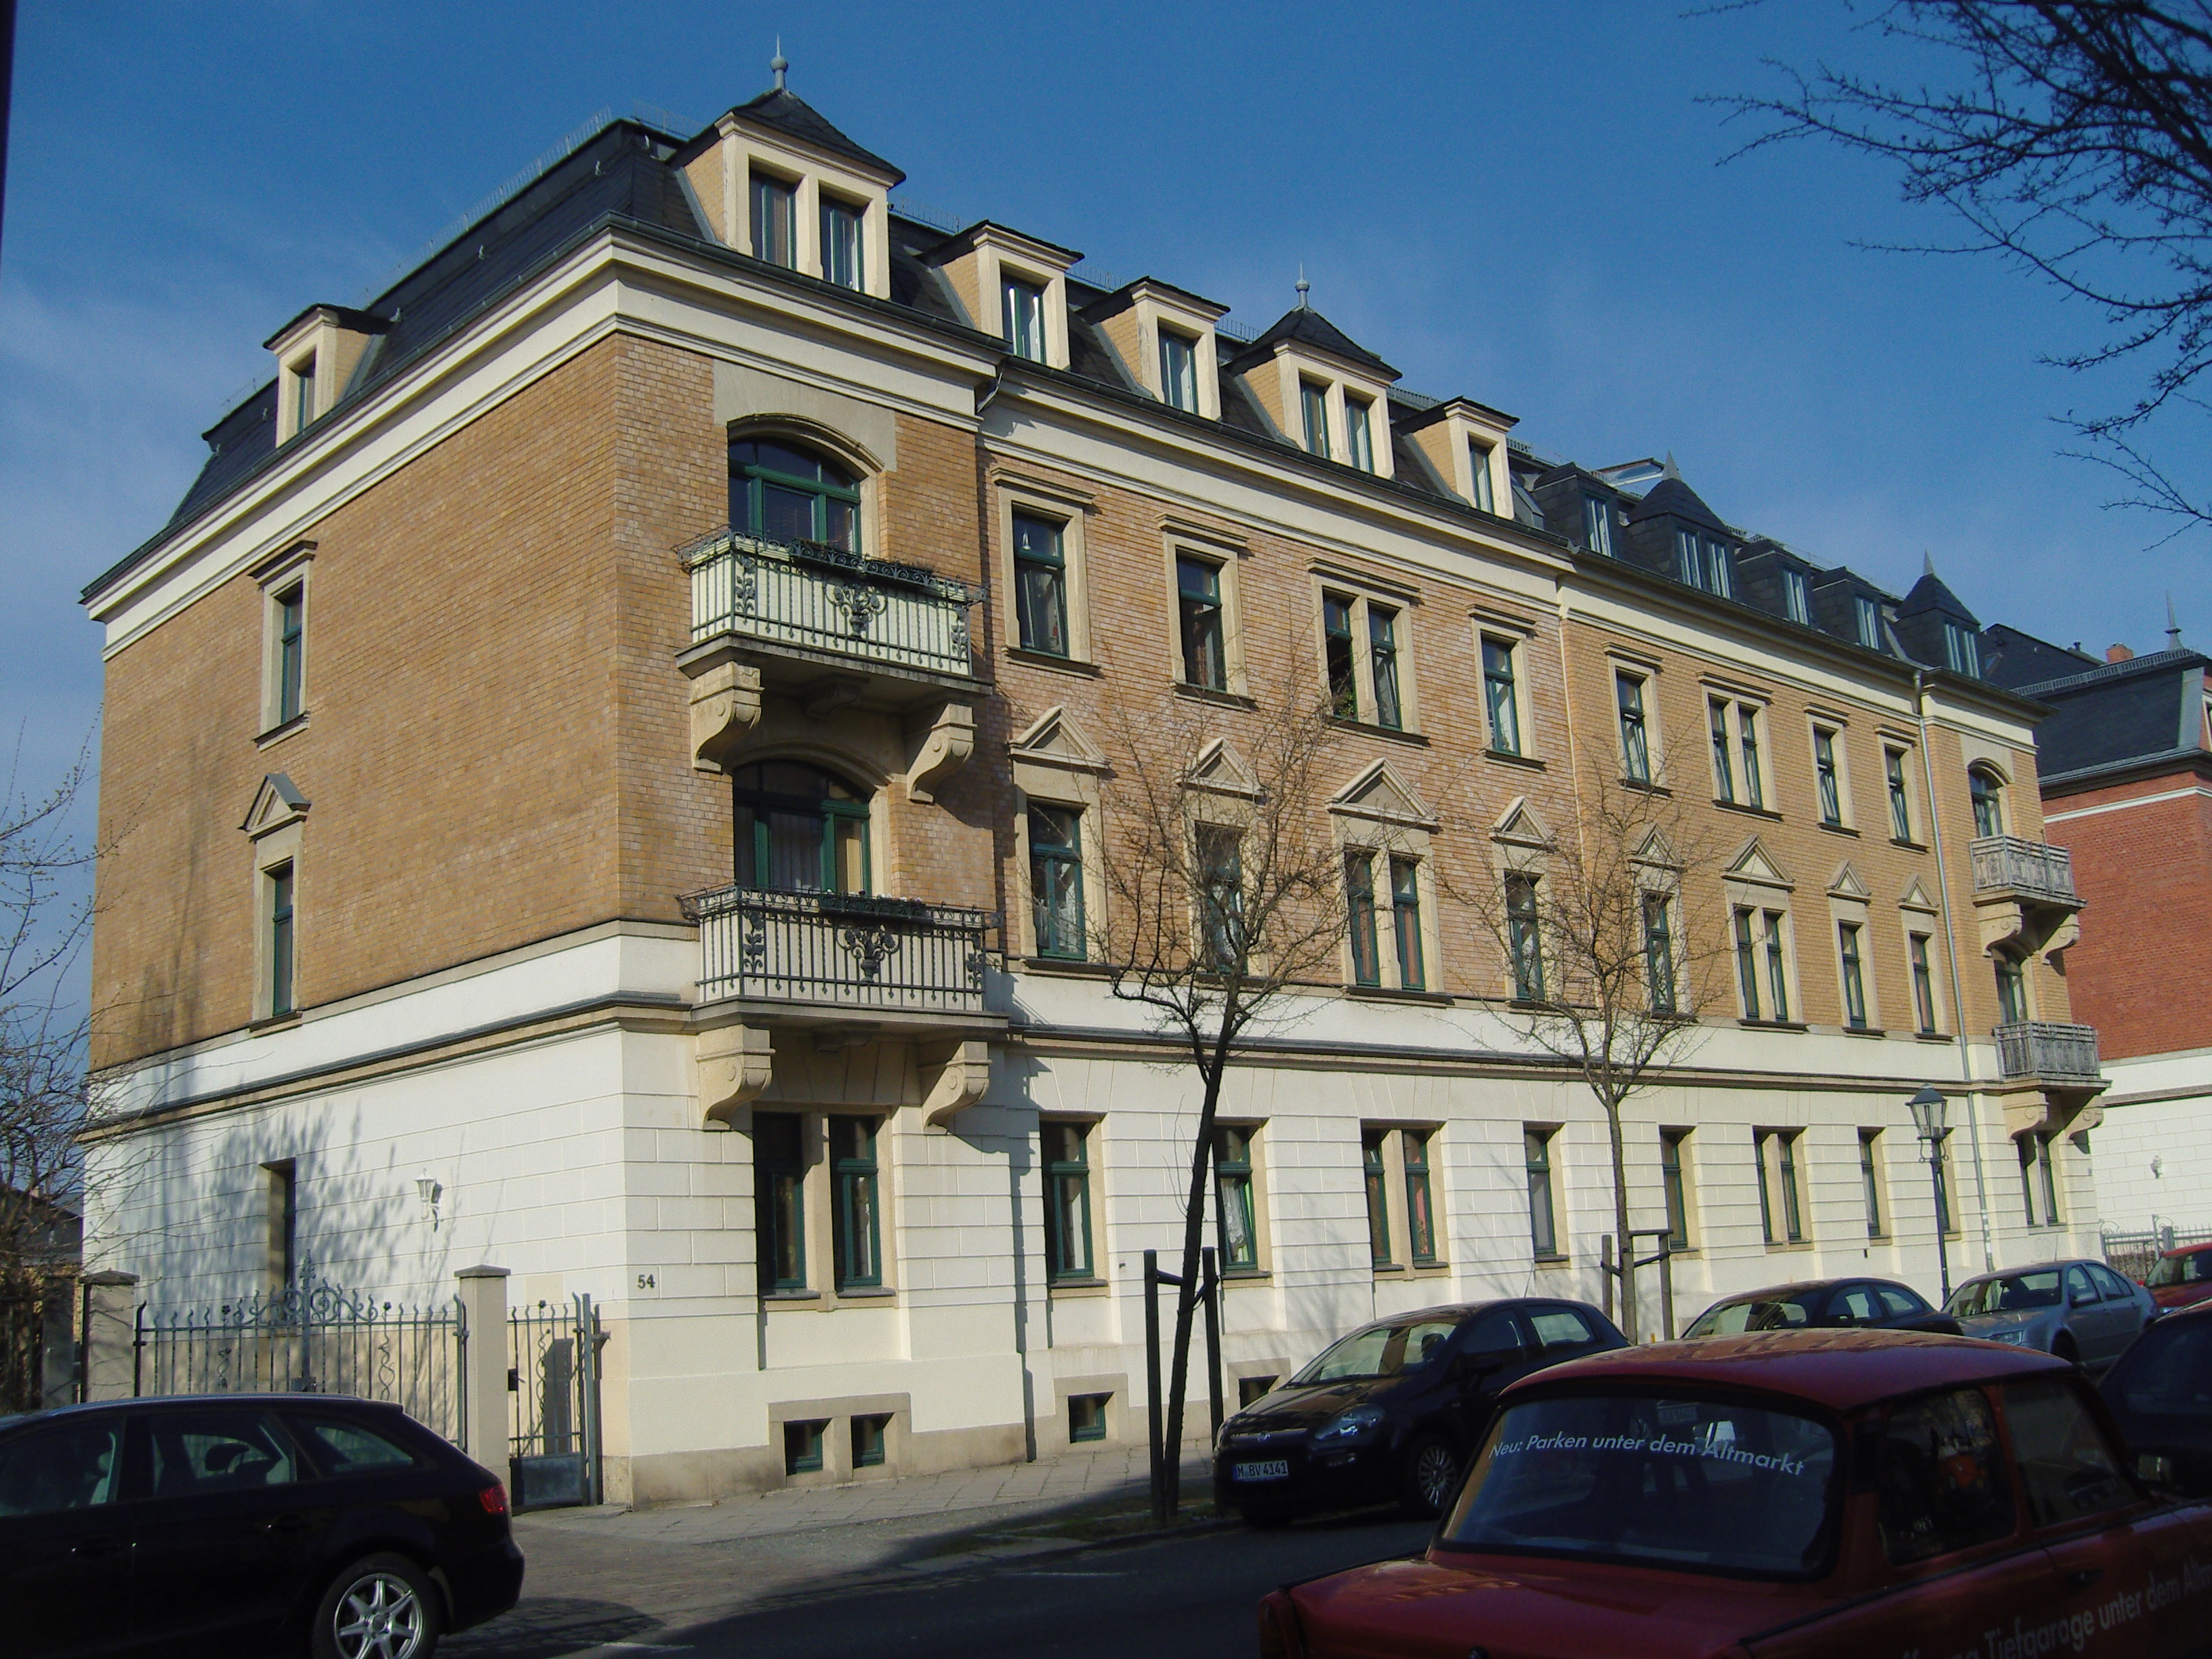 Barbarastraße